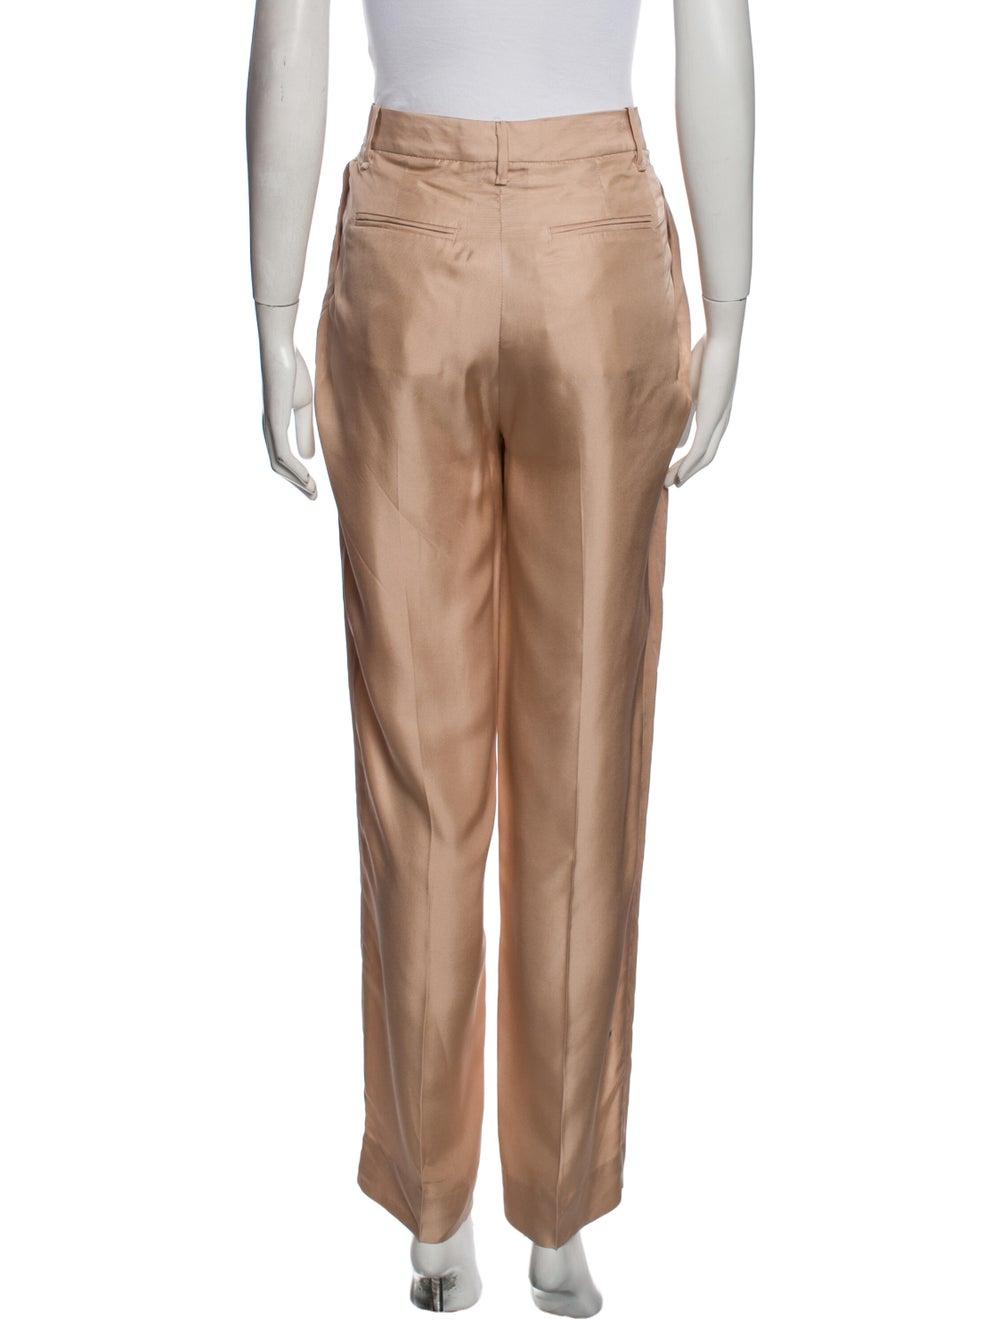 Rag & Bone Silk Straight Leg Pants - image 3